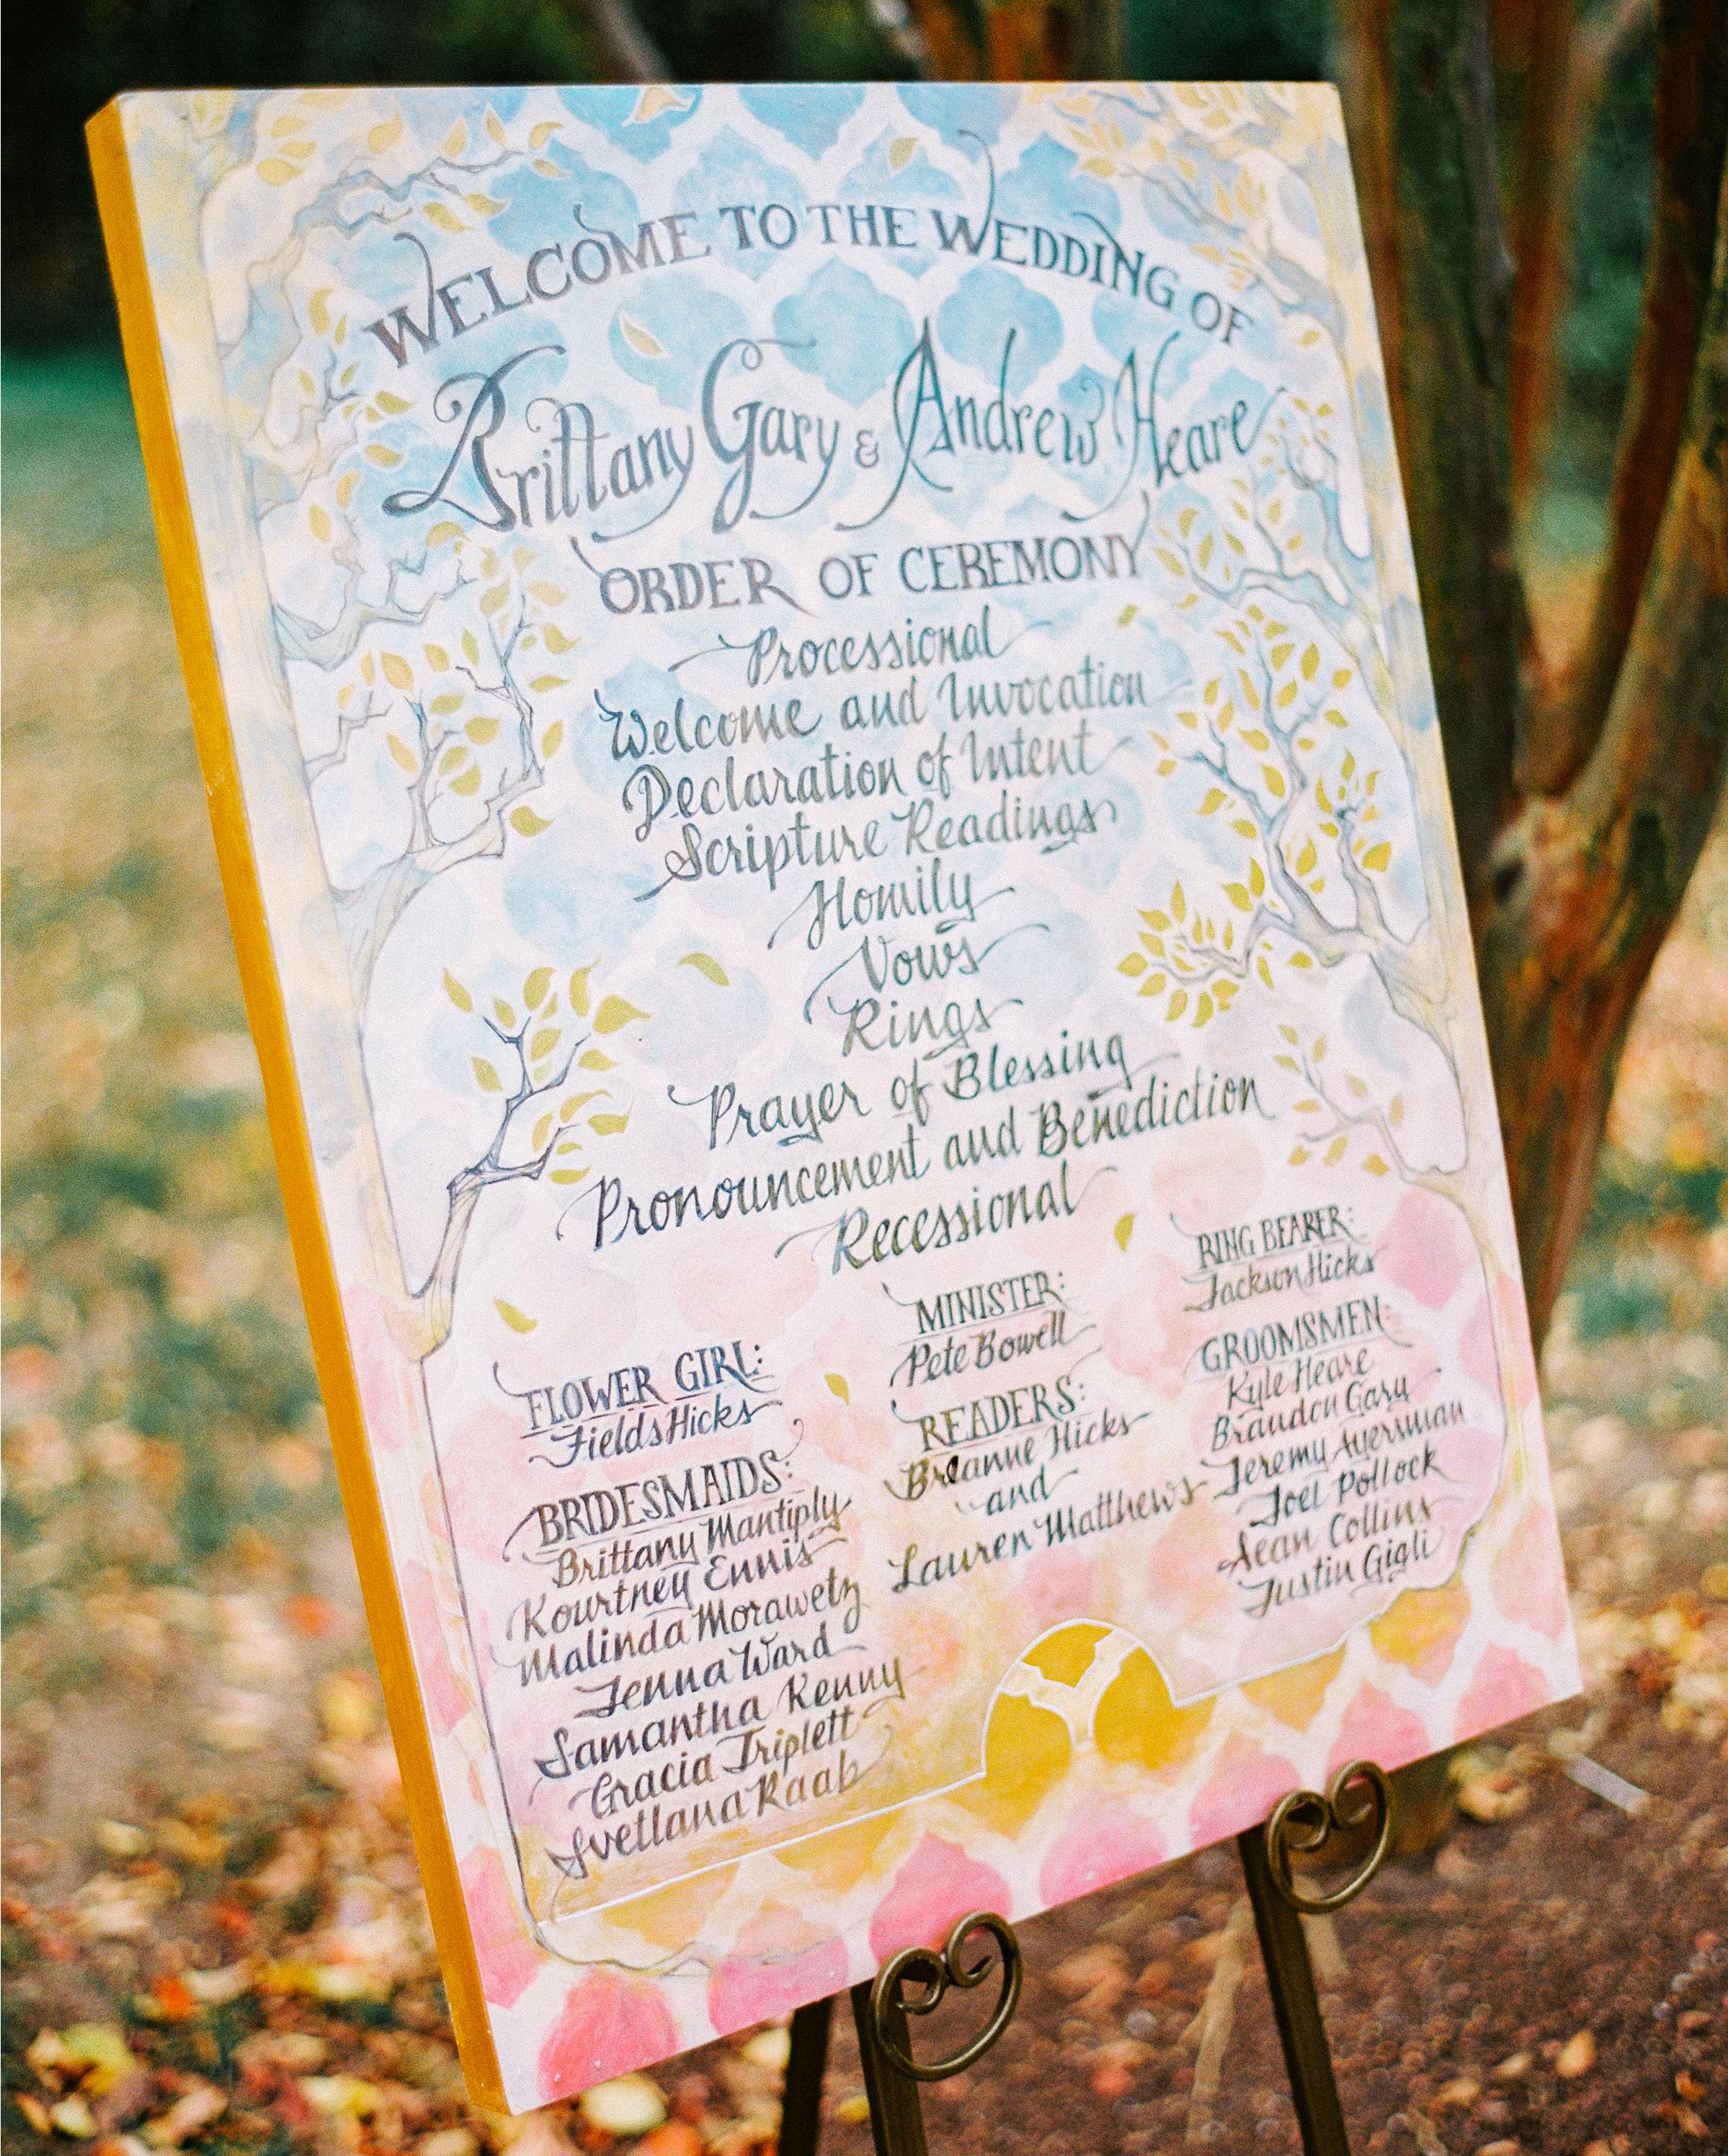 brittany-andrew-wedding-program-048-s112067-0715.jpg